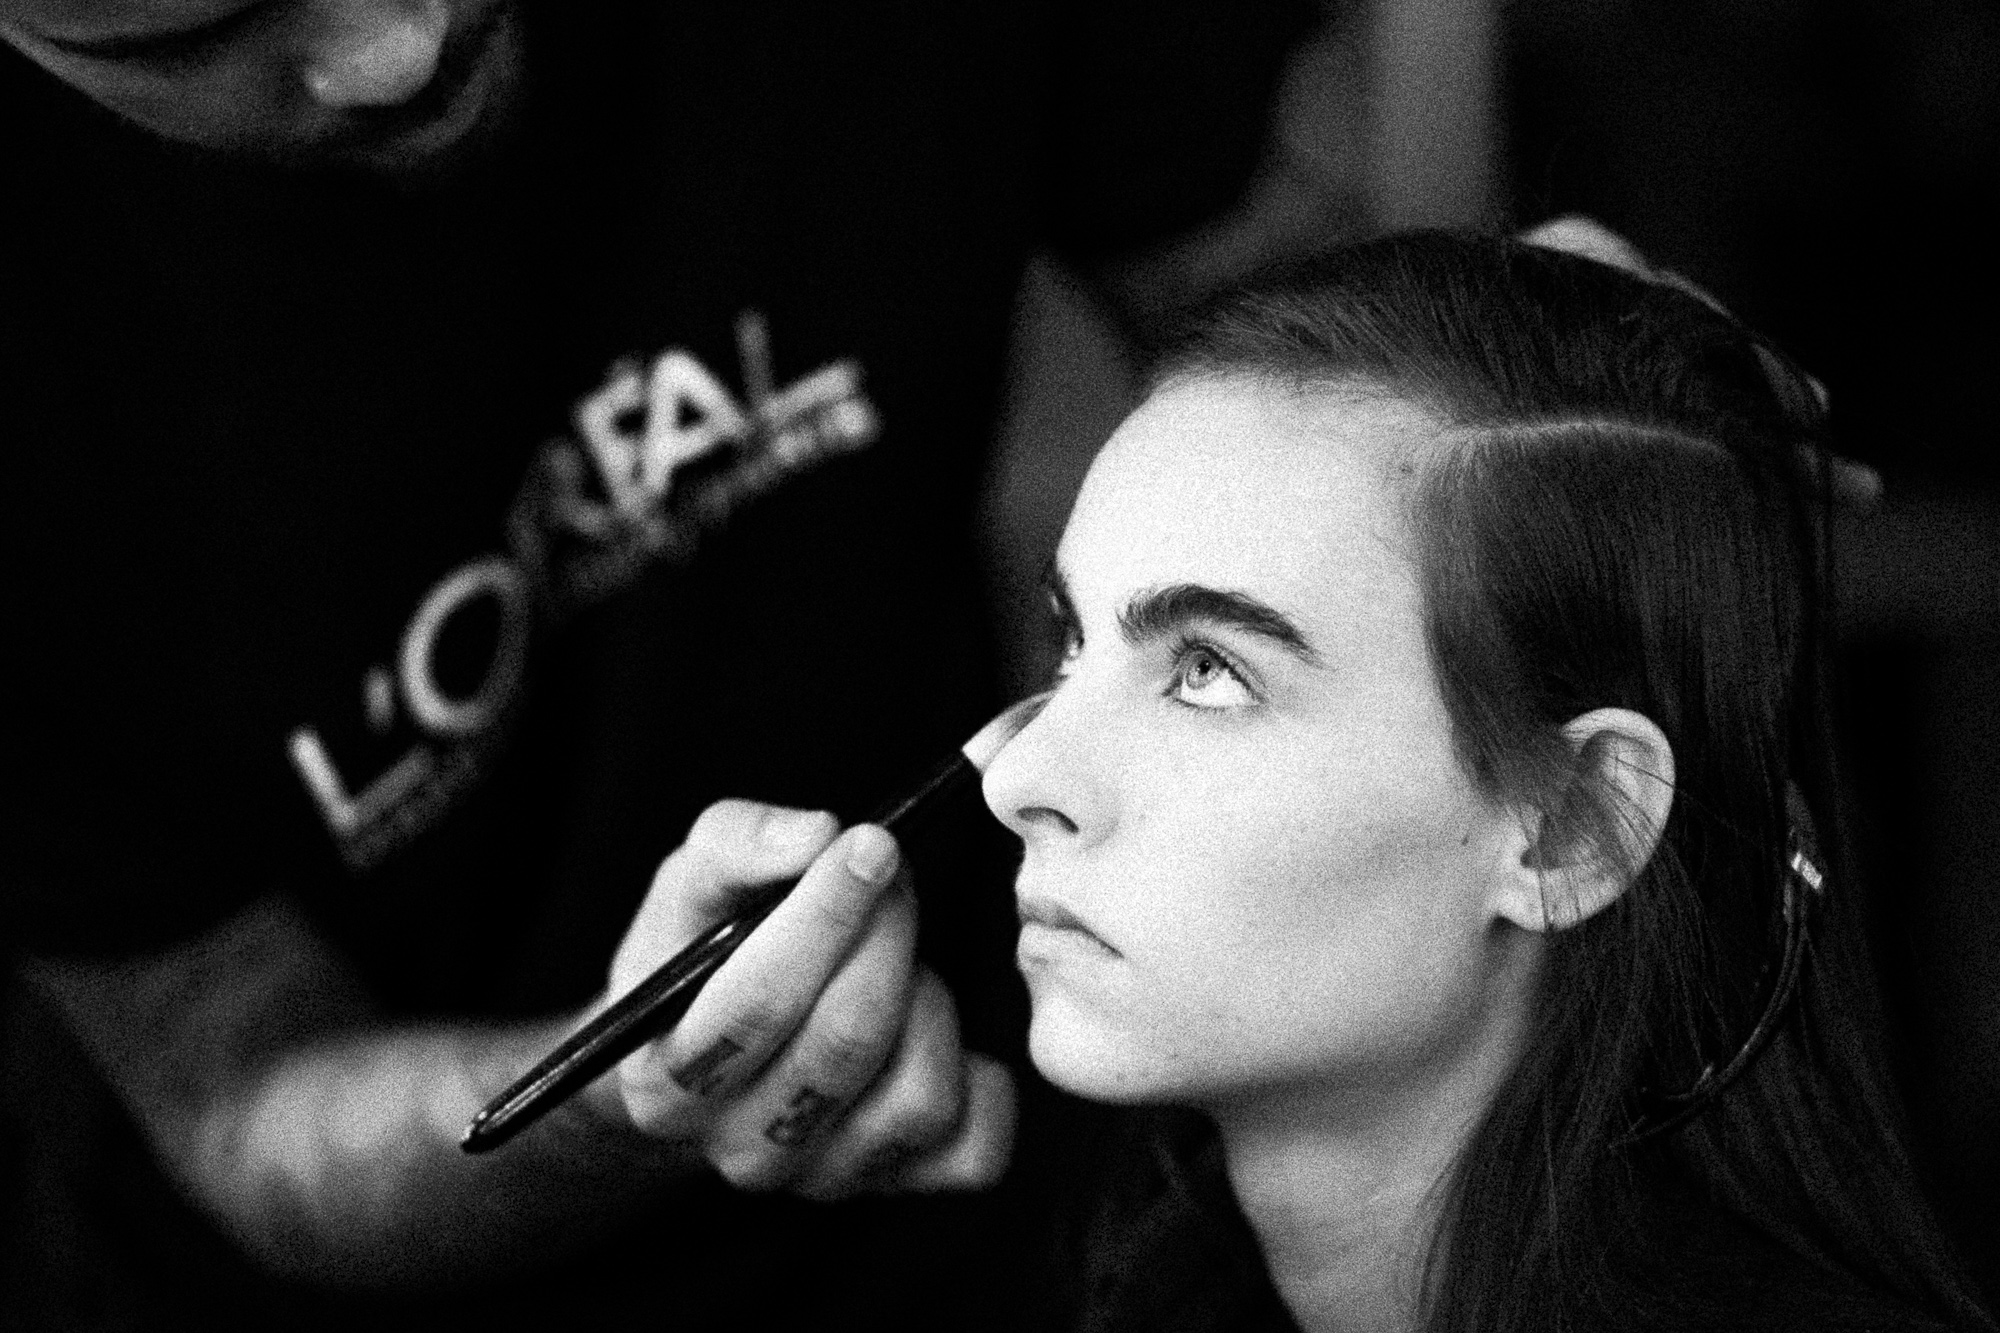 oscar-arribas-beauty-backstage-madrid-fashion-week-cibeles-photography-moda-desfile-fotografo-photographer-portrait-retrato-14__MG_5909.jpg